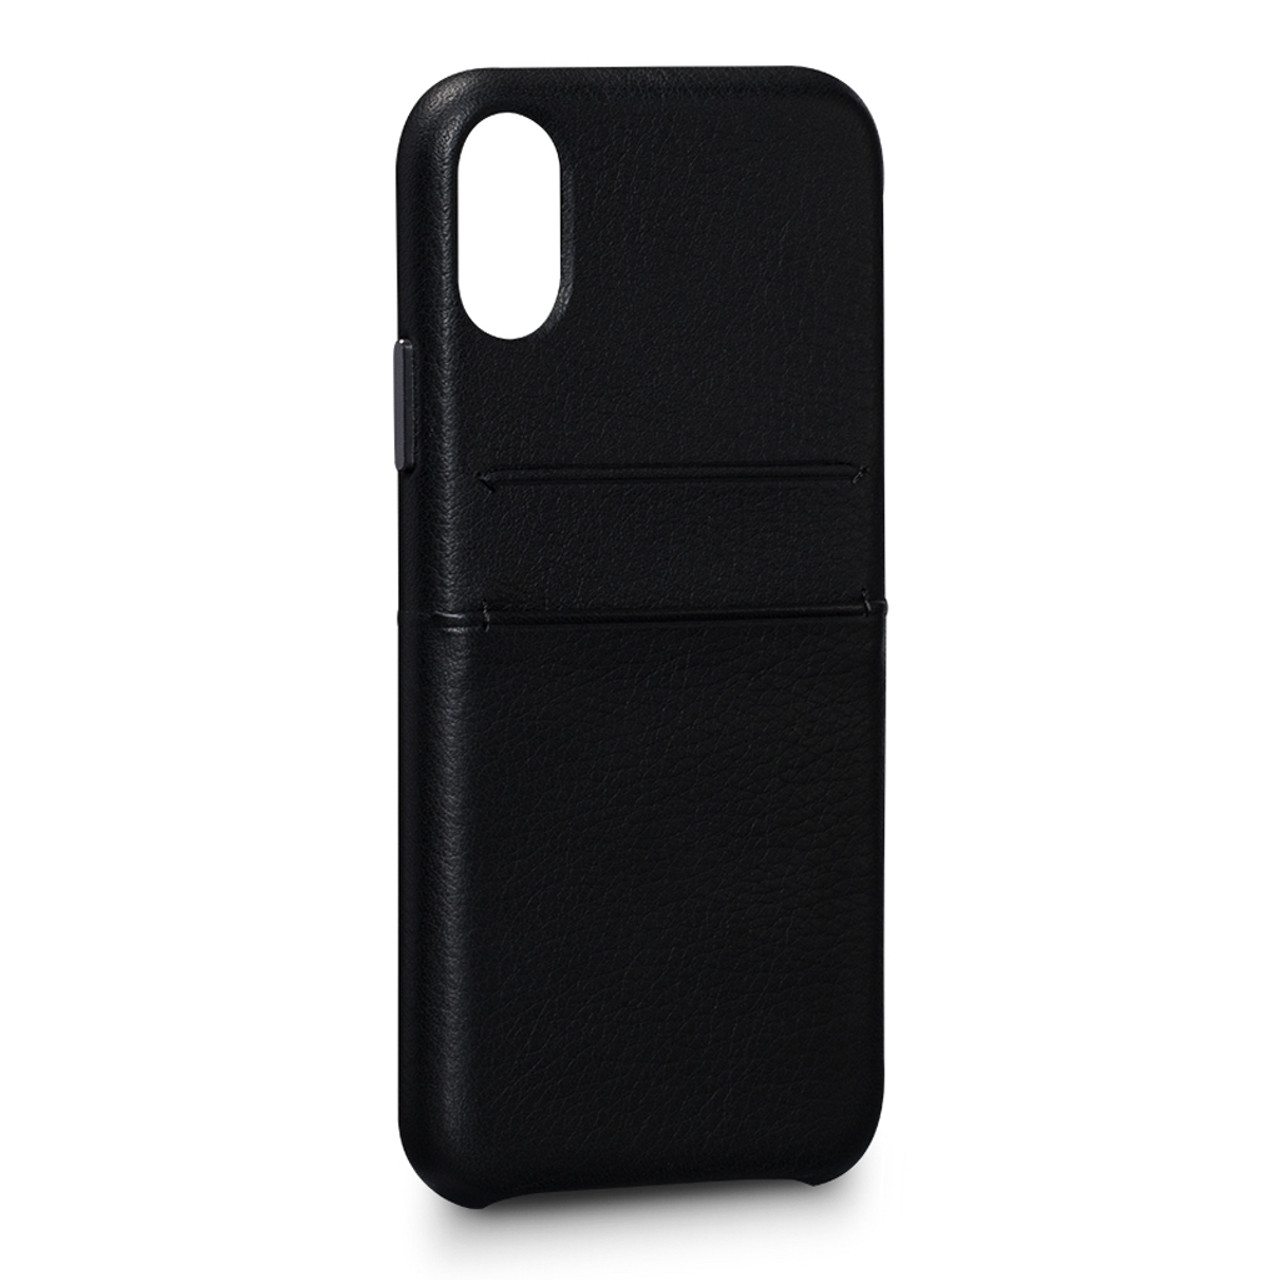 new products 8d3d4 cc40f SENA Bence Snap-on Wallet Case iPhone X/Xs - Black